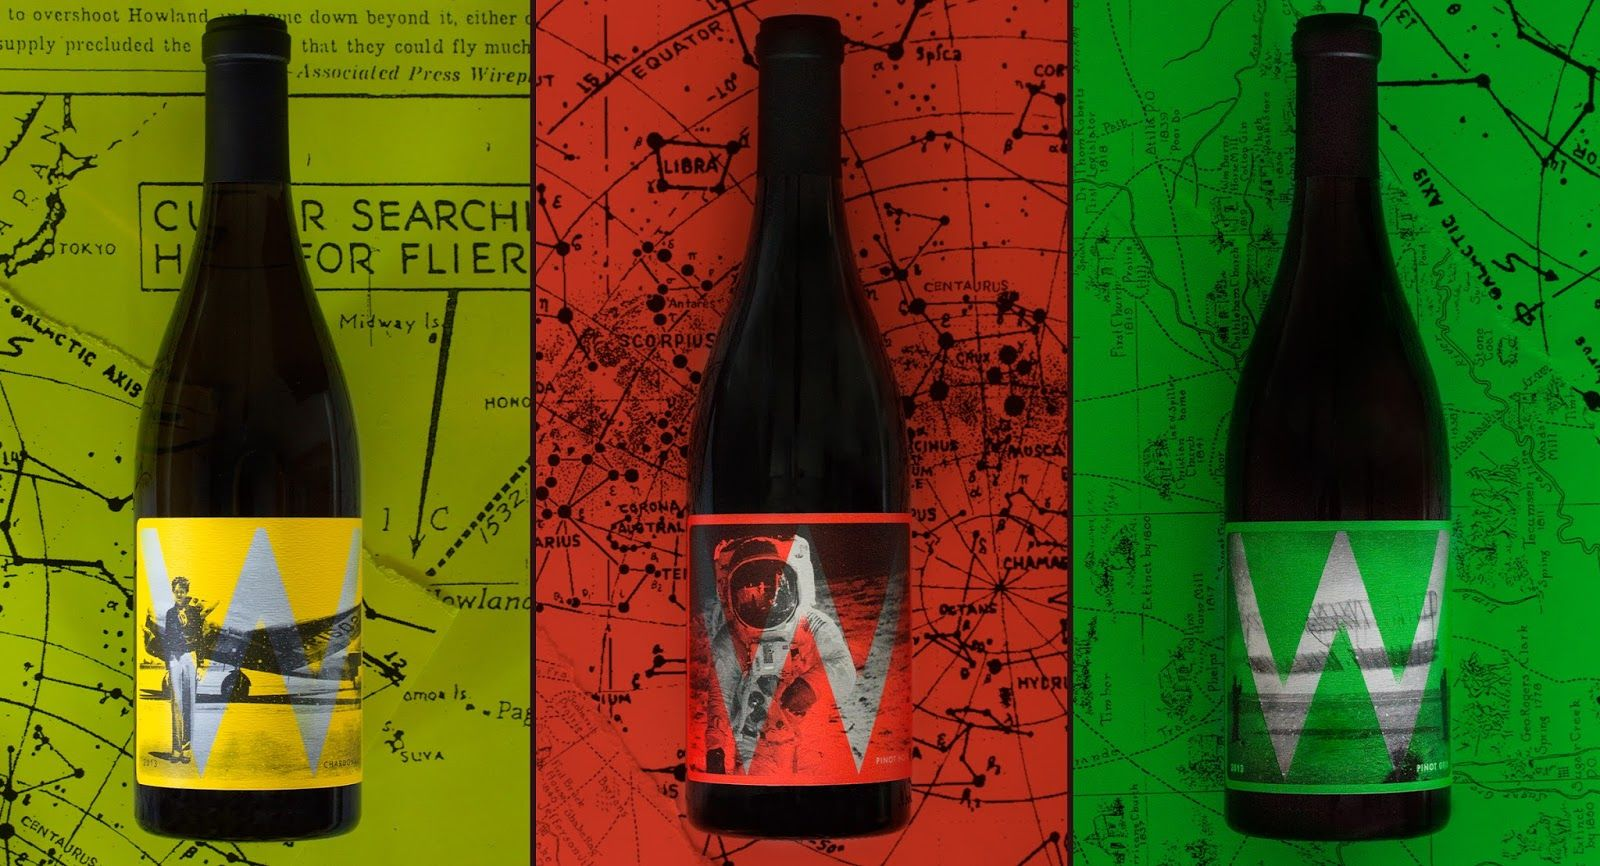 Wonderwall Here To Break The Rules Wine Packaging Design Creative Packaging Design Wine Packaging